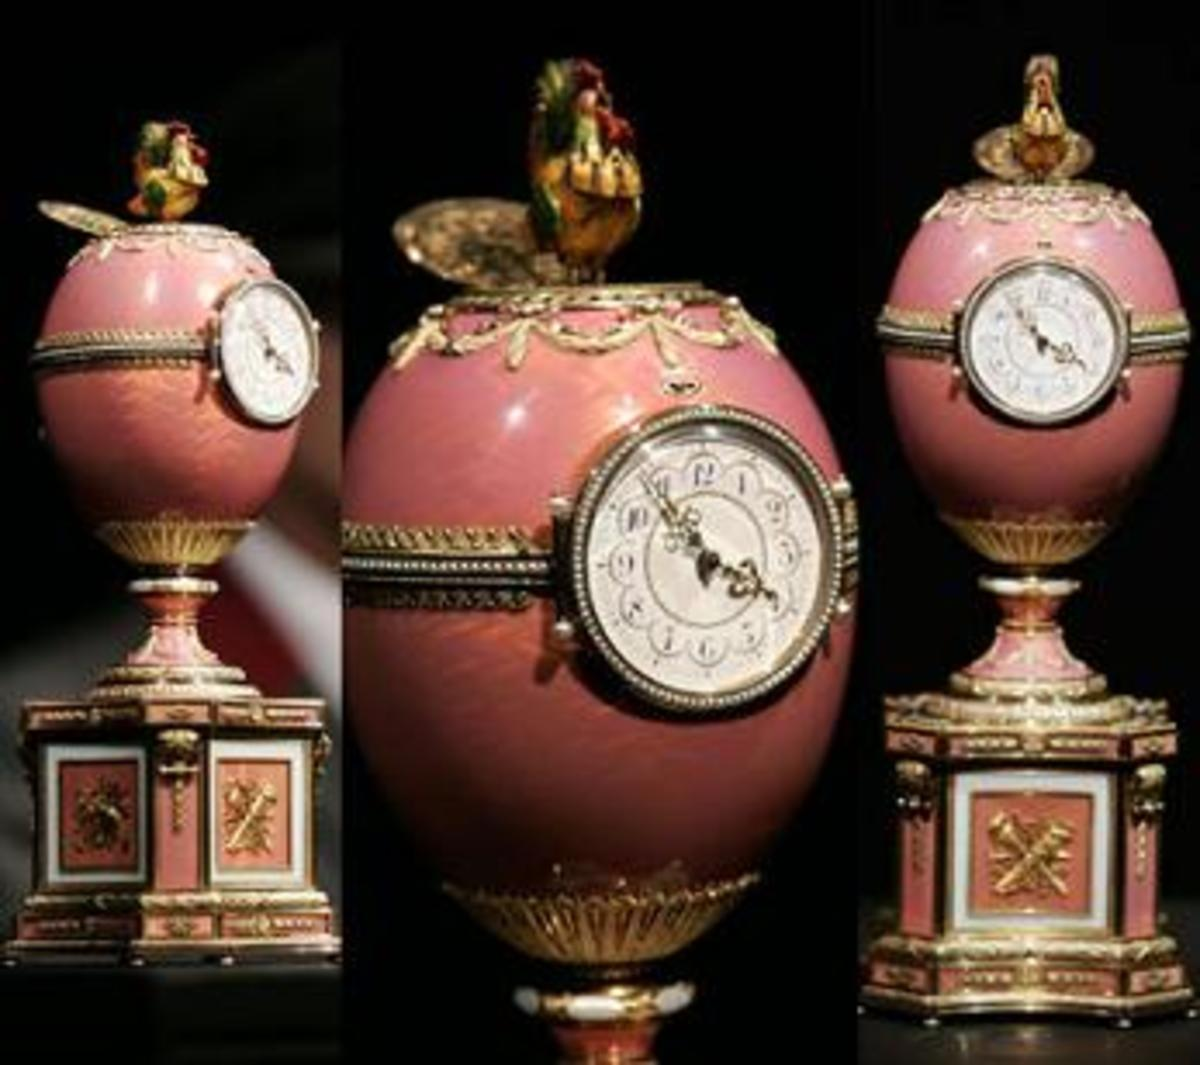 Rothschild Faberge Eggs